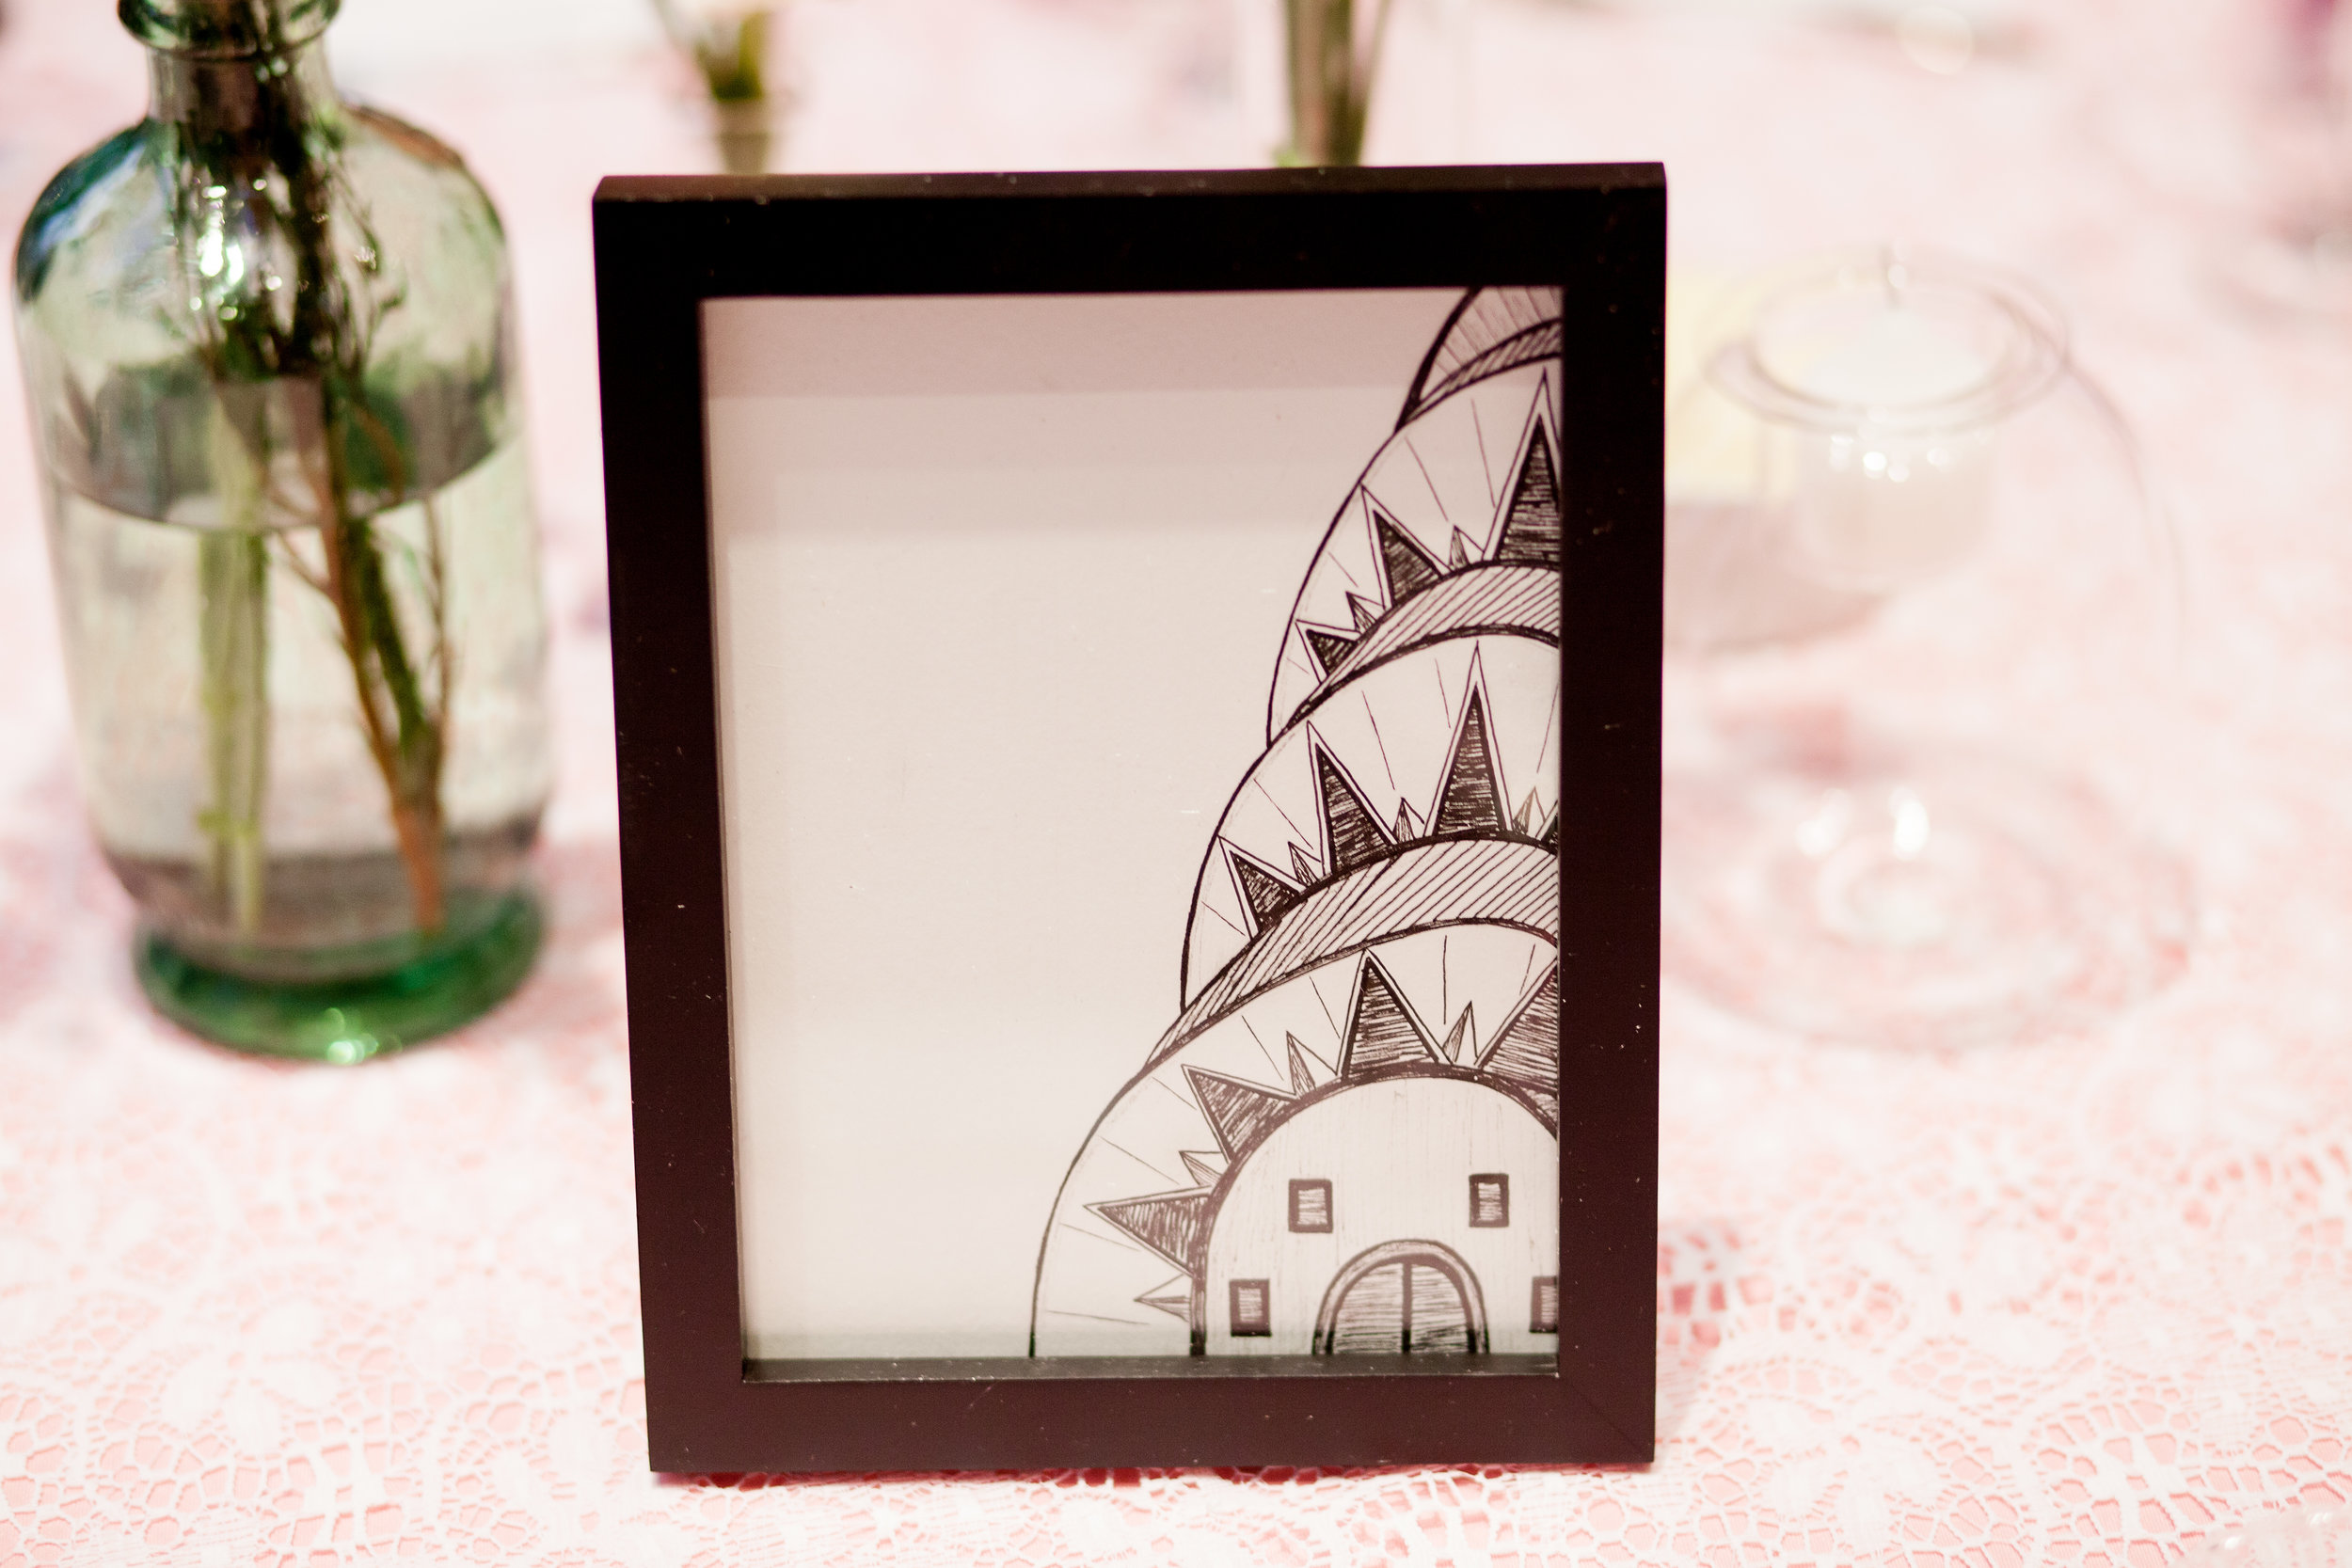 Pineapple Street Designs Stationery Illustrations for Weddings (25).jpg